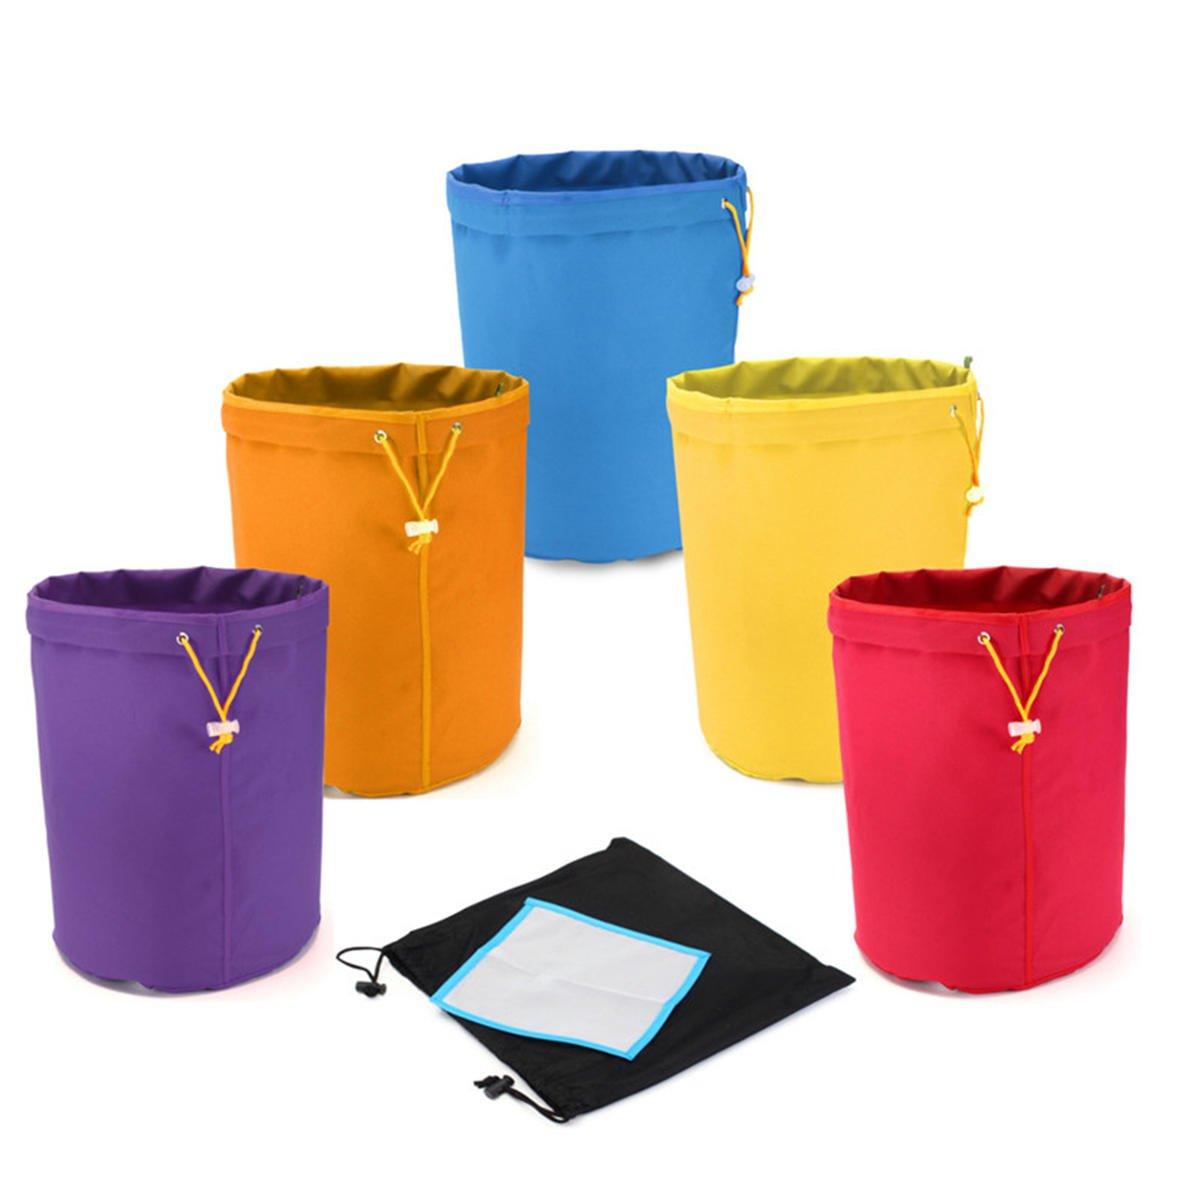 5 Pcs 1 Gallon Bubble Bag Multi-color Herb Filter Bag Plant Residue Filter Bag